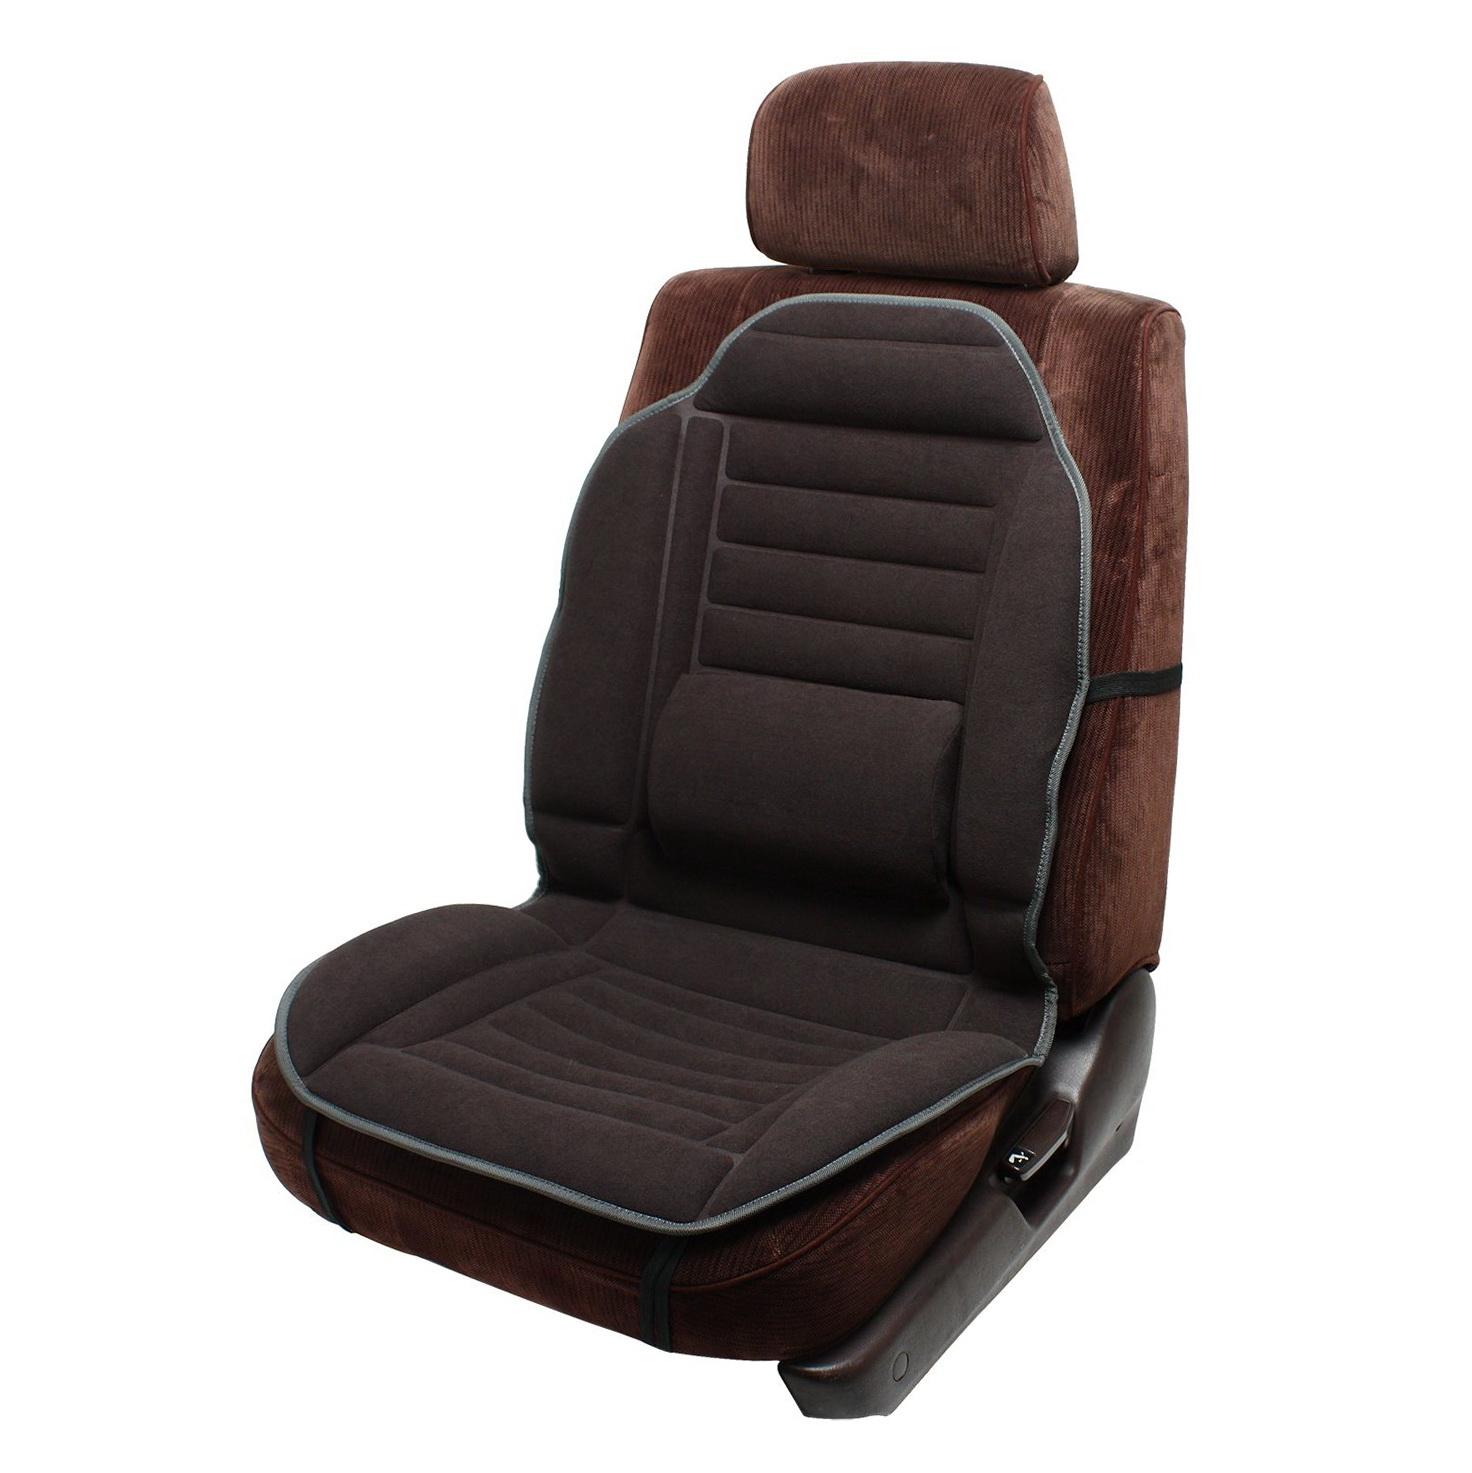 Automobile Seat Cushion Wedge